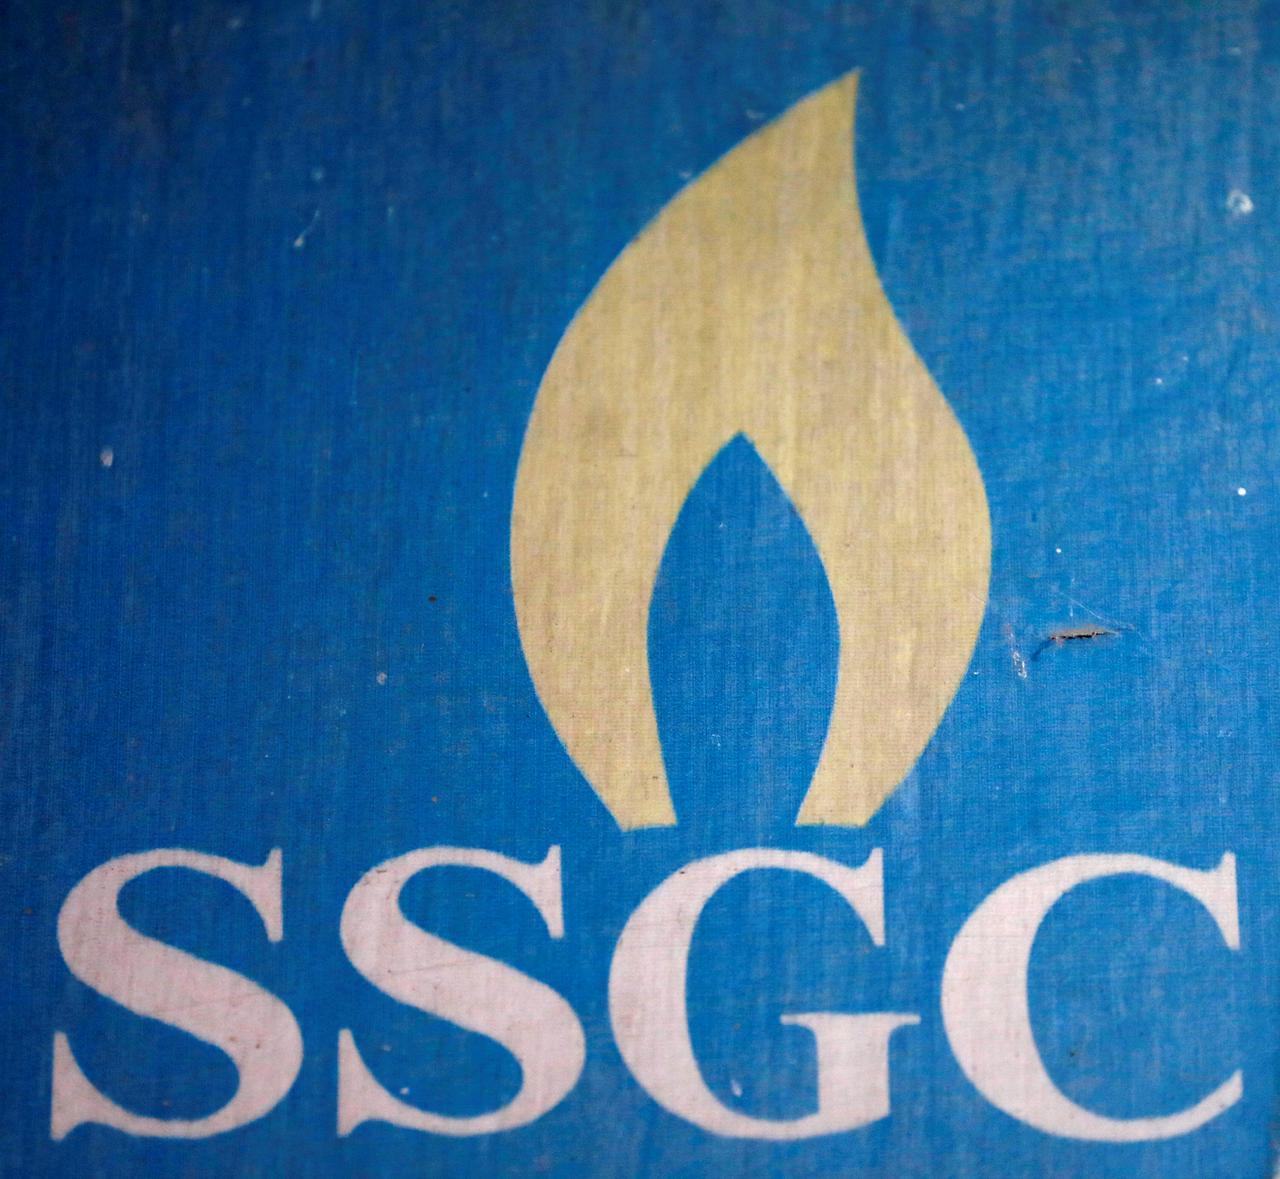 Pakistan's PM sacks heads of gas utilities over energy